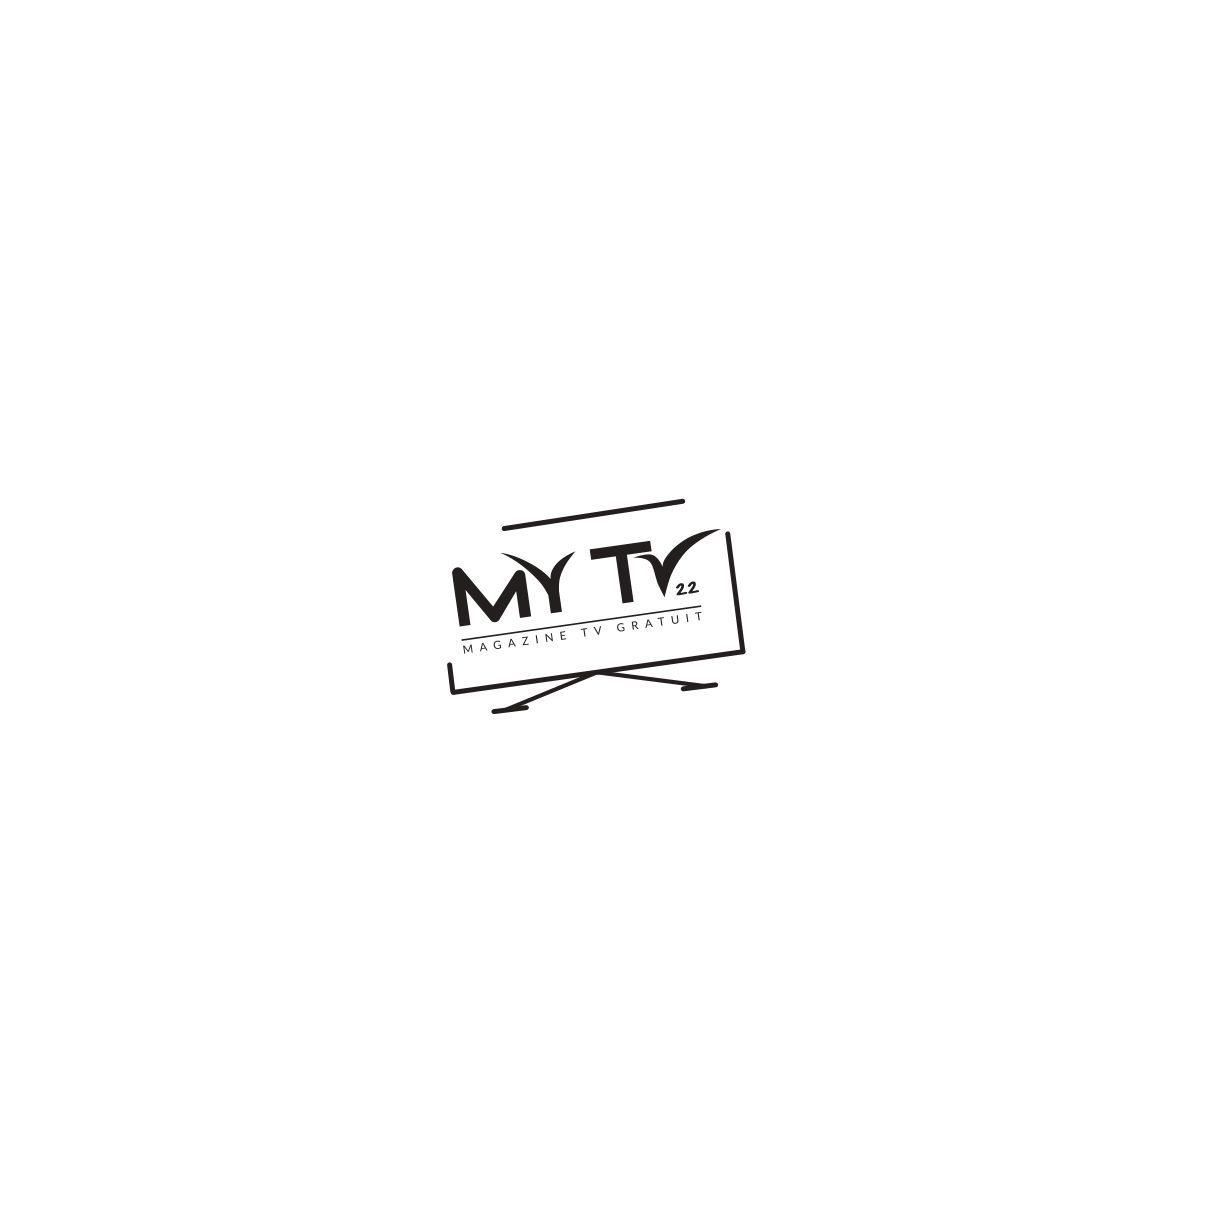 2020- MY TV LOGO TELE_page-0001